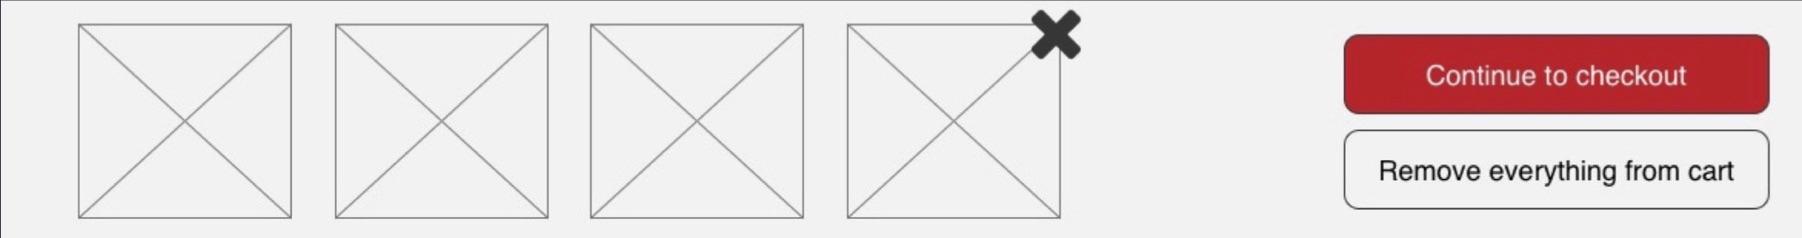 test2-mockups3.jpg